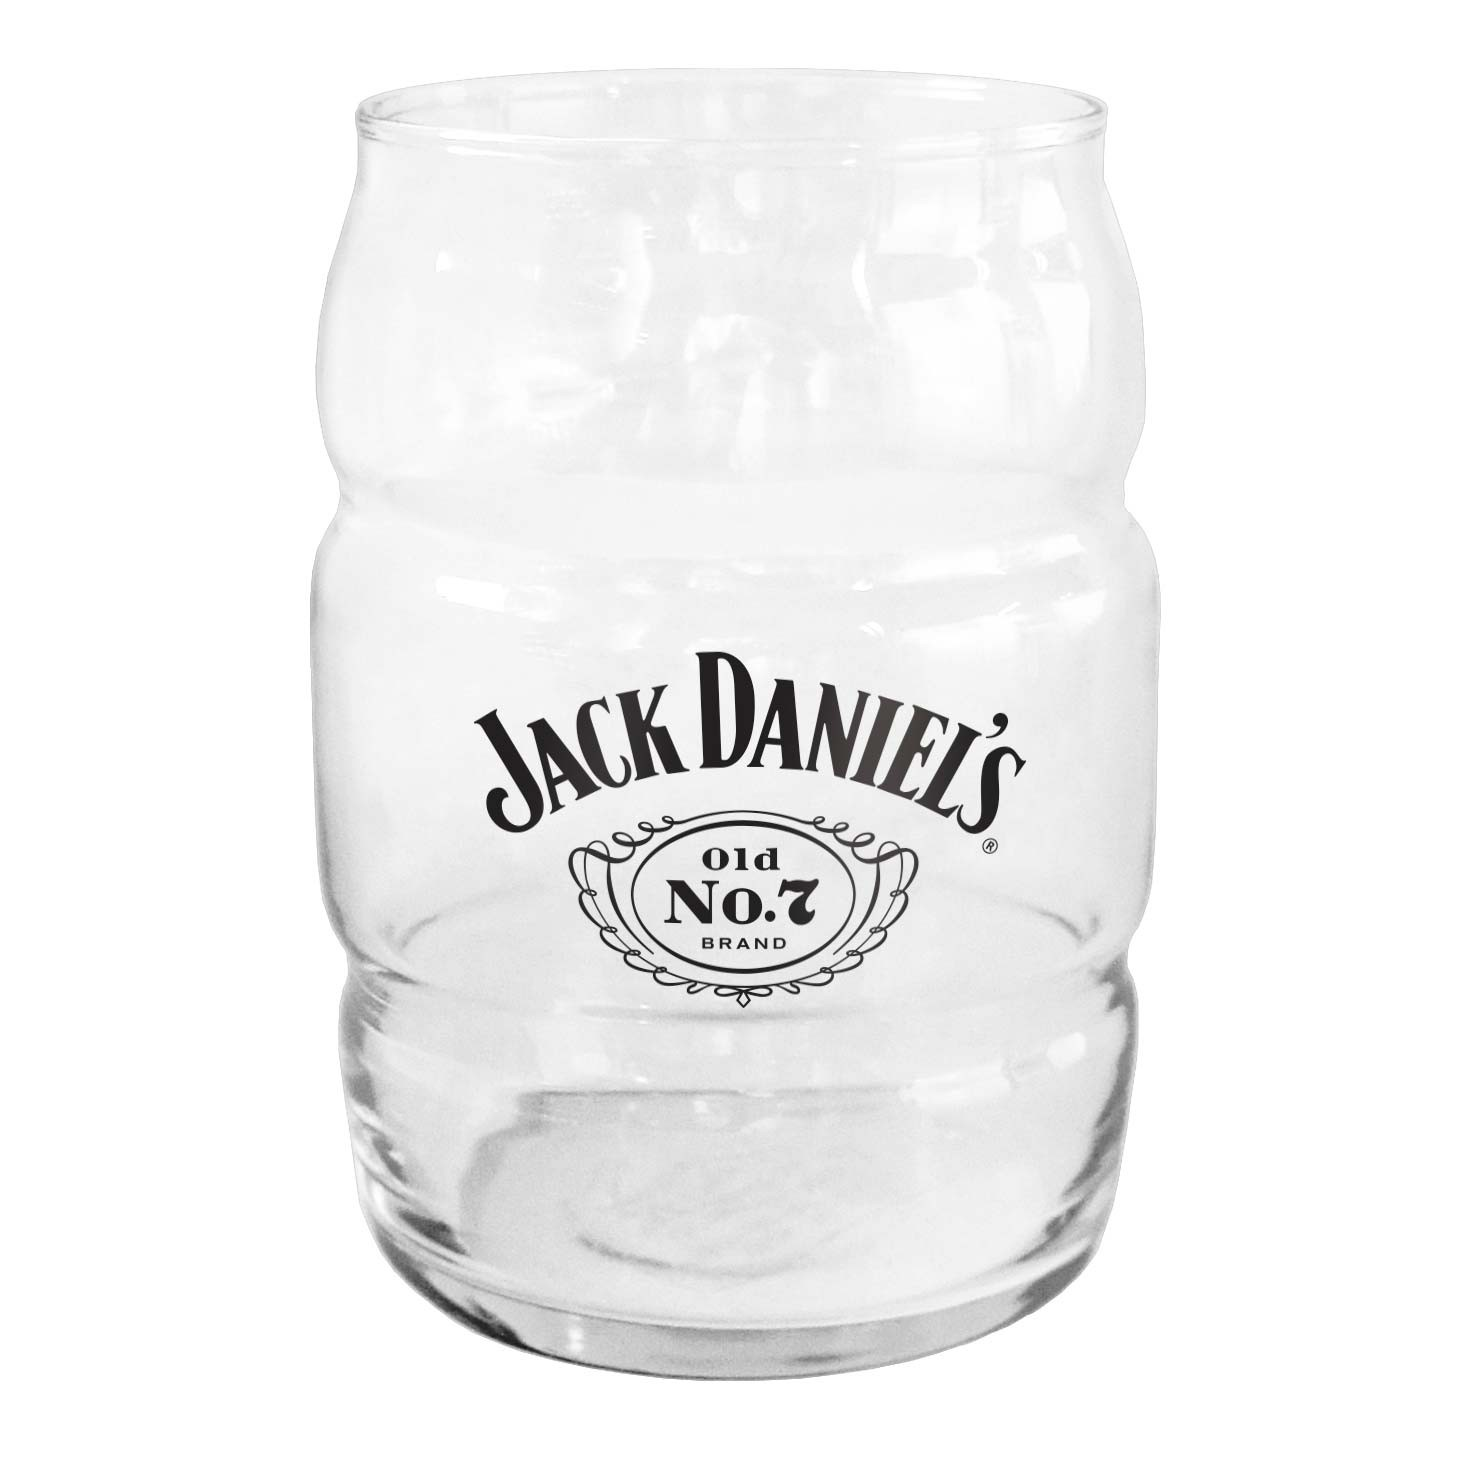 Jack Daniels Barrel Pint Glass